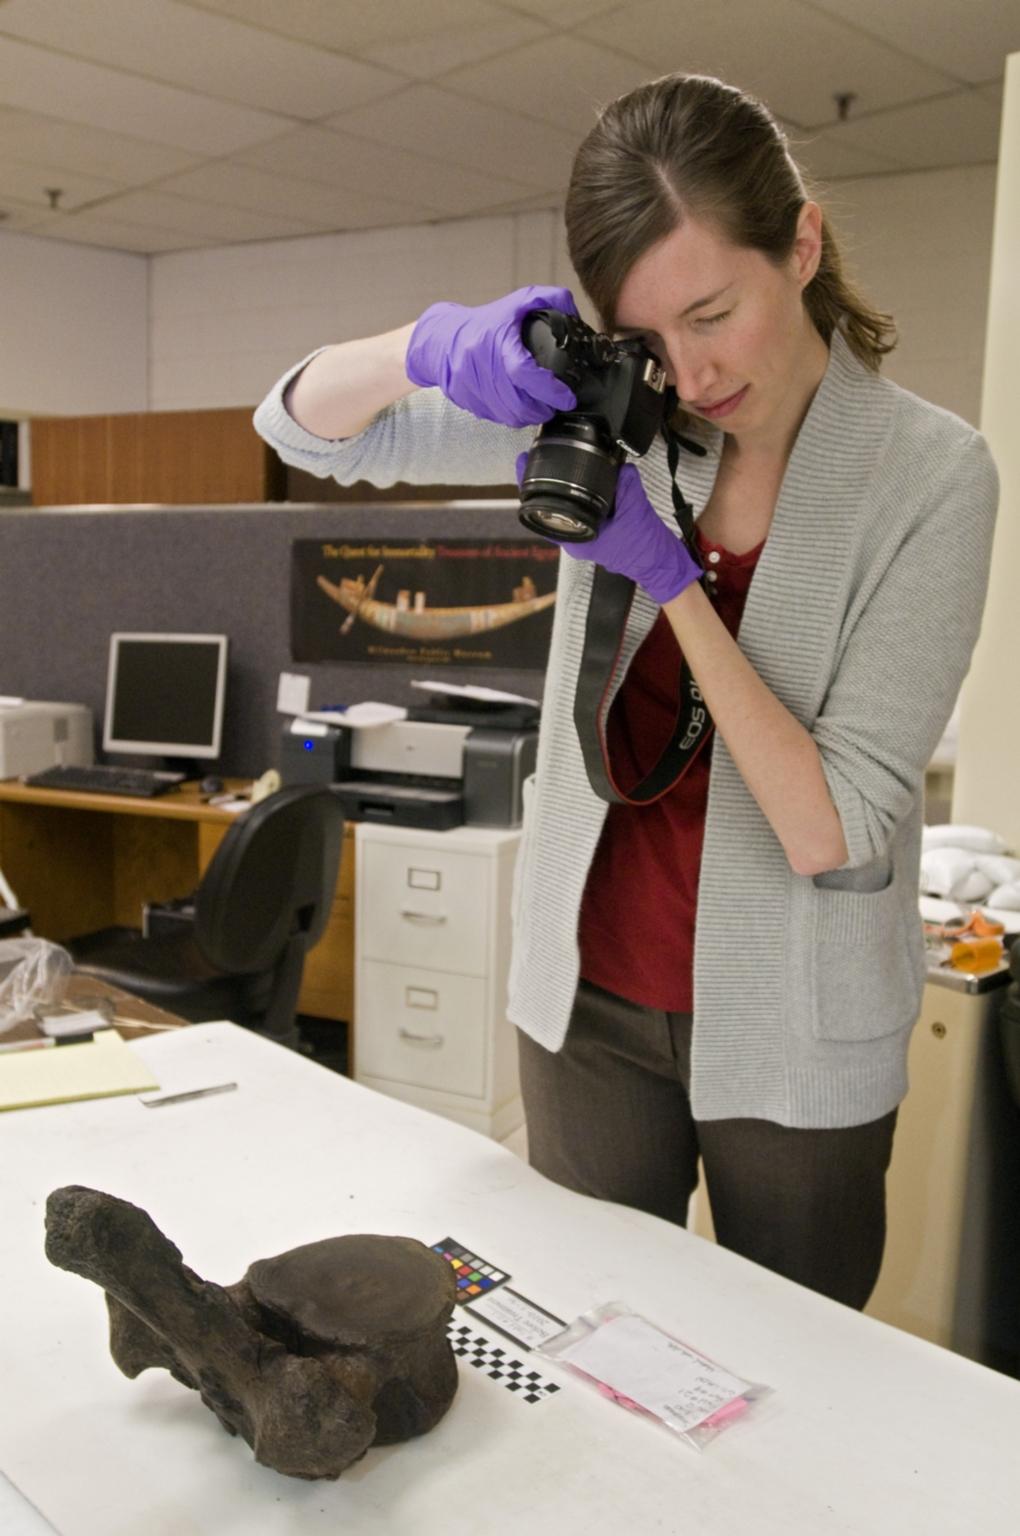 Photographing a vertebra from Snomastadon Excavation